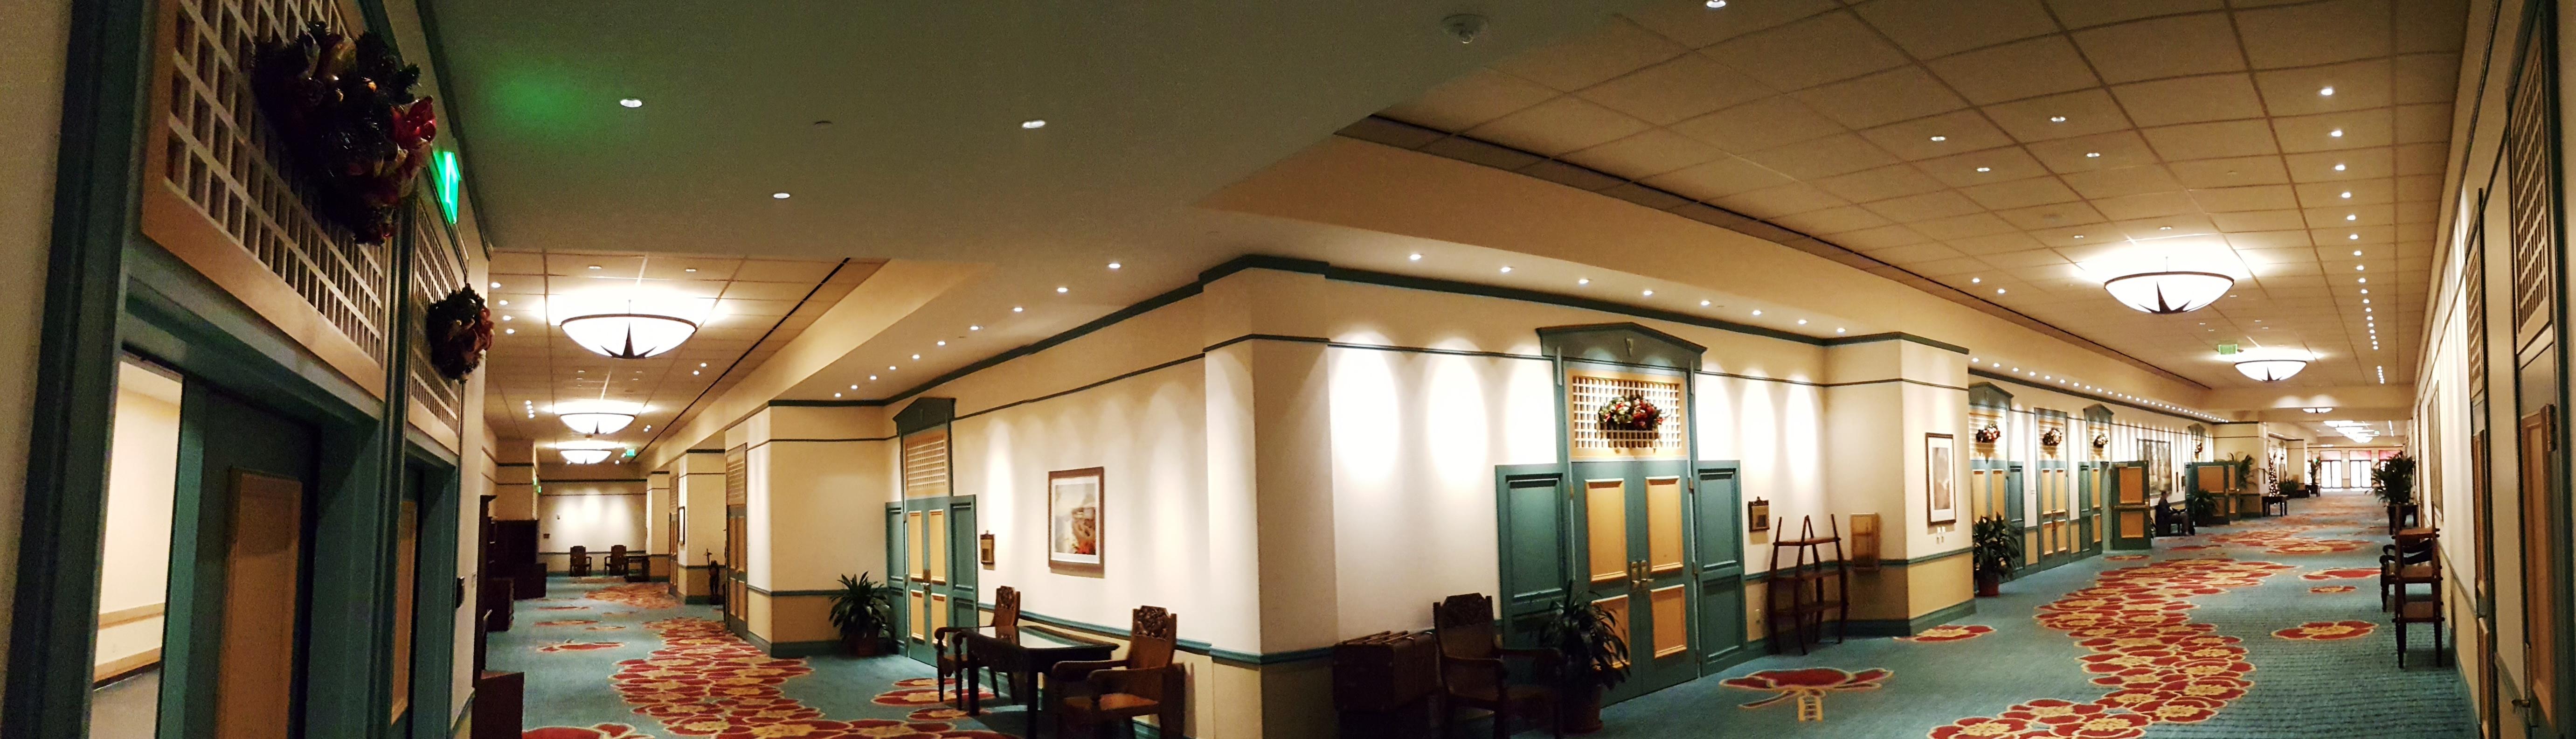 Loews Royal Pacific Ballroom Expansion - Narrative photo - common areas panoramic